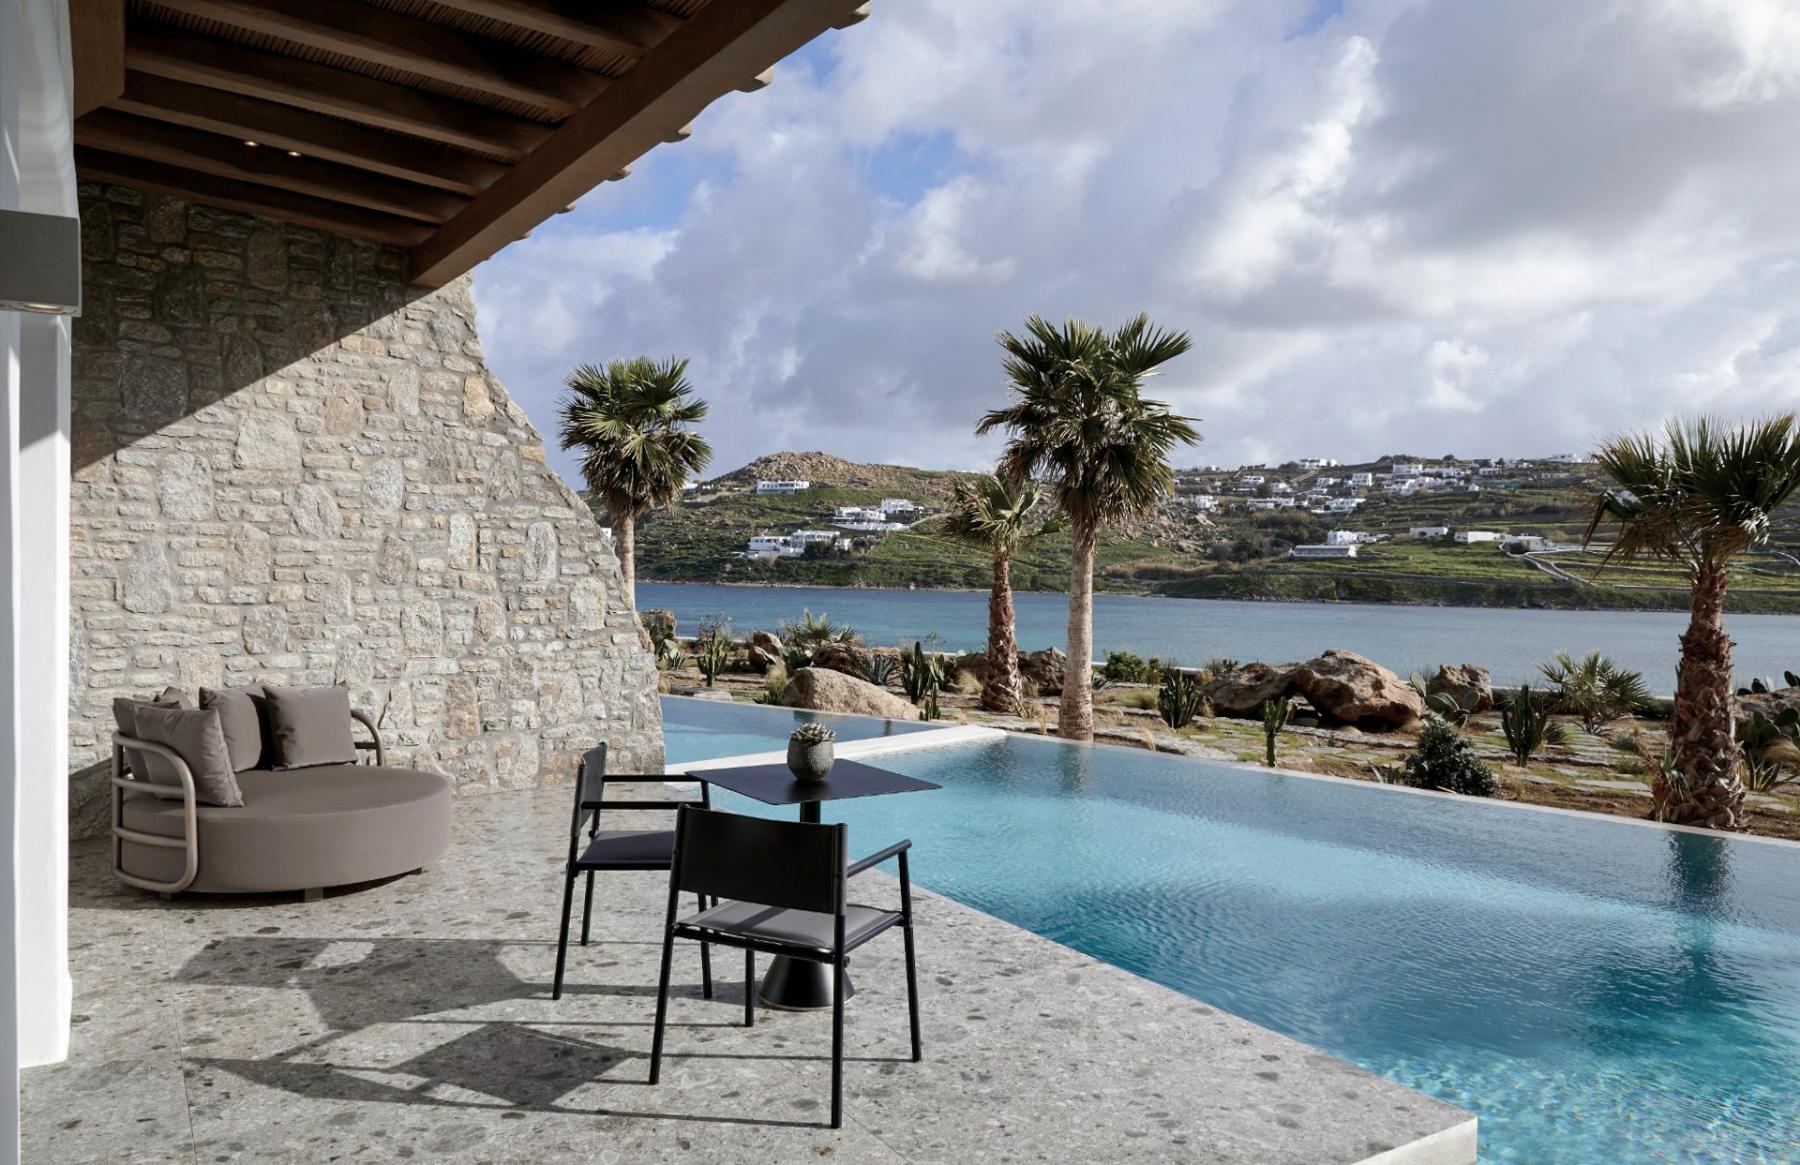 20_Aeonic-Suites-Spa-Luxury-Hotel-Mykonos-100